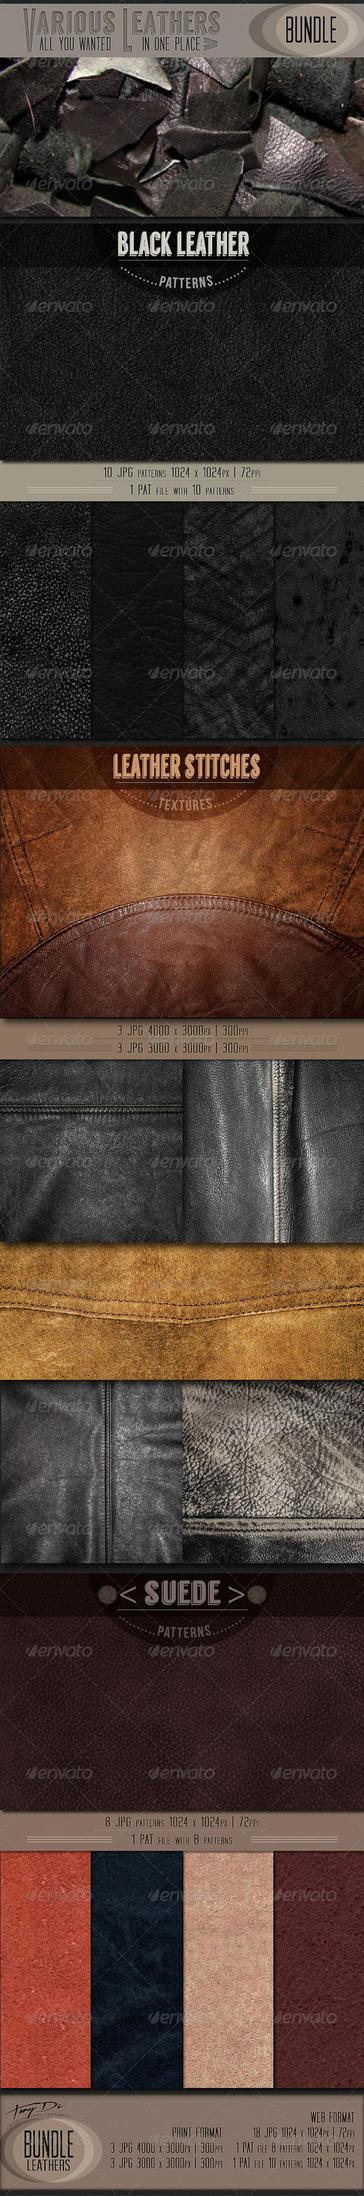 Various Leathers | Bundle by AzureRayArt